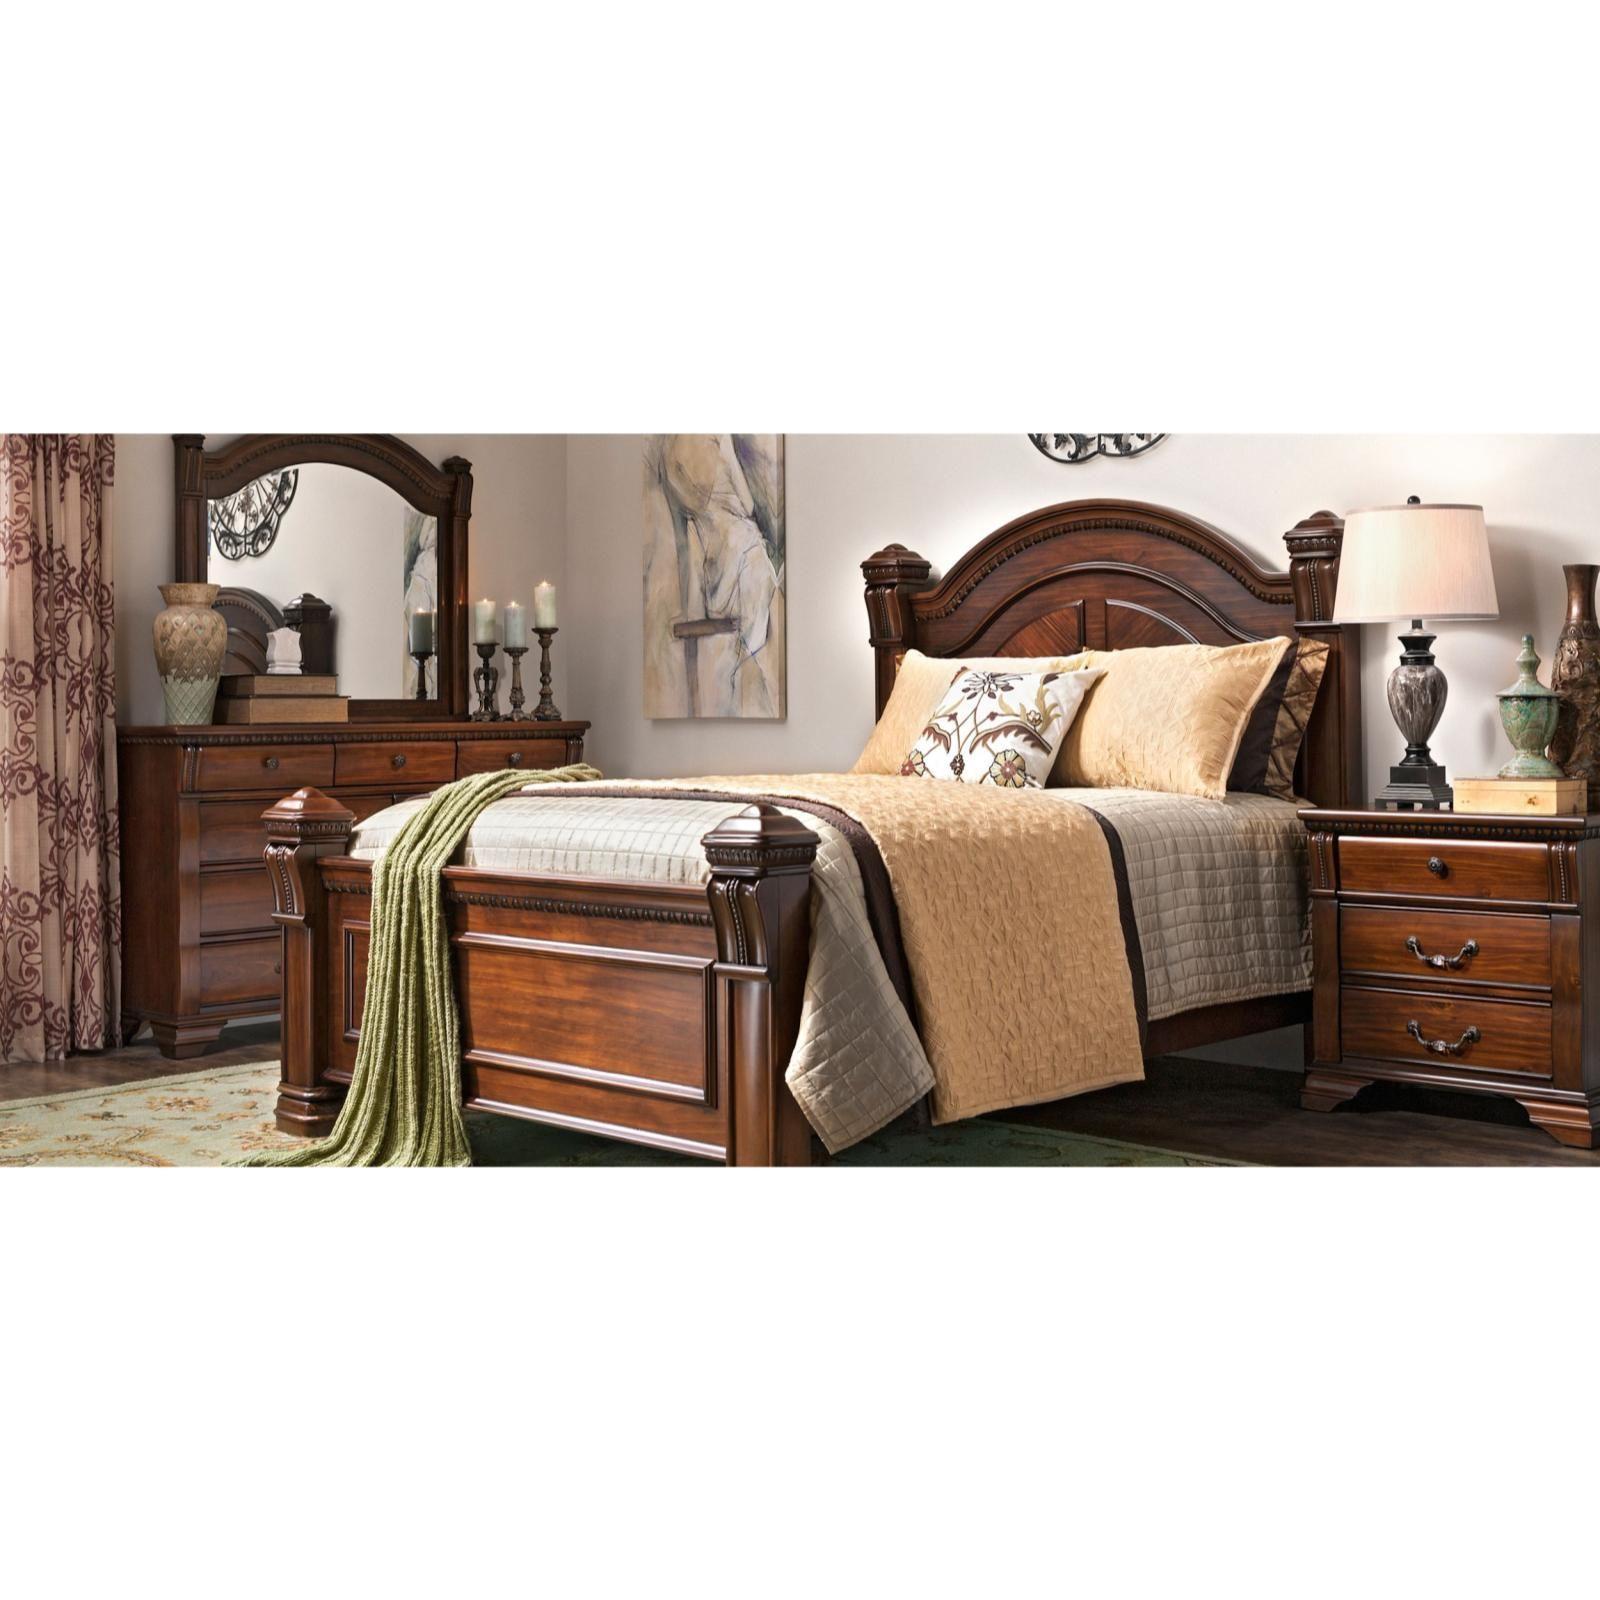 47+ Adams furniture bedroom sets information